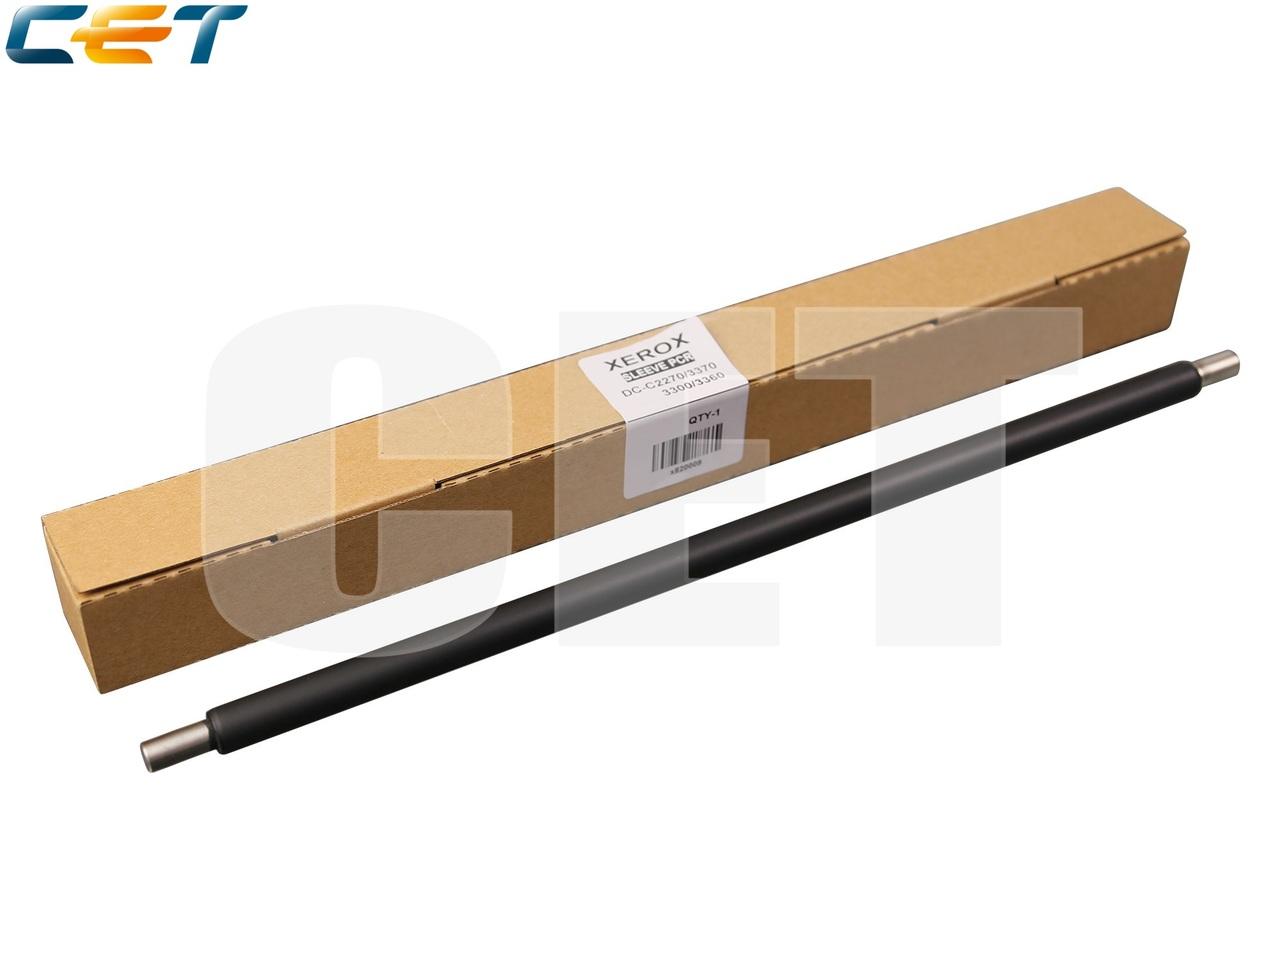 Ролик заряда для XEROX WorkCentre7425/7428/7435/7525/7530/7535/7545/7556 (CET), CET7922